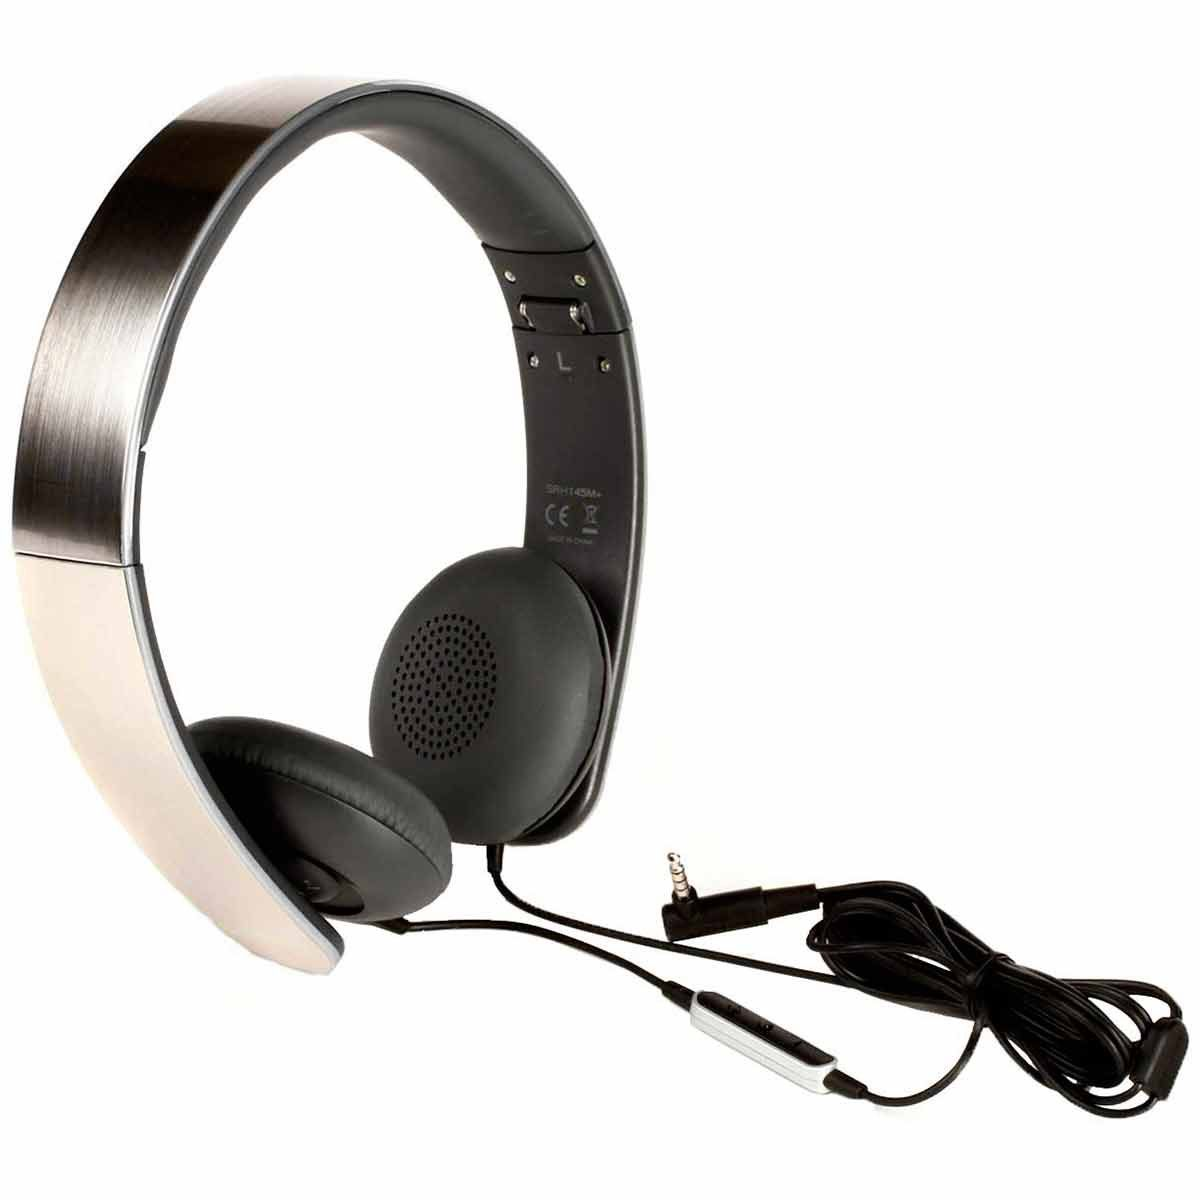 Fone de Ouvido Headphone SRH145M+ 34 Ohms Shure